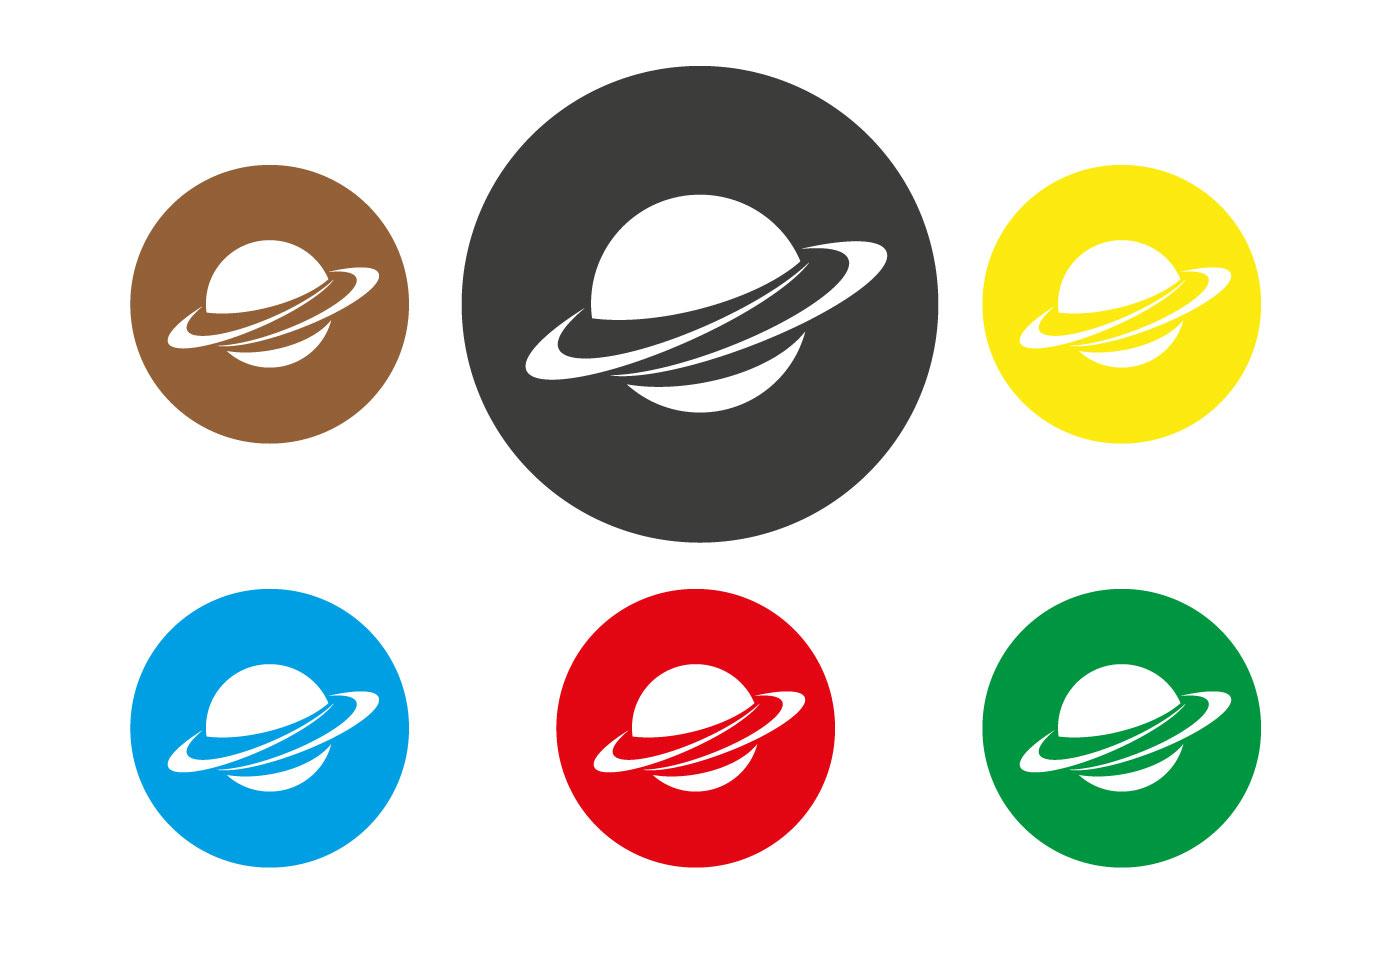 planet saturn logo - photo #25